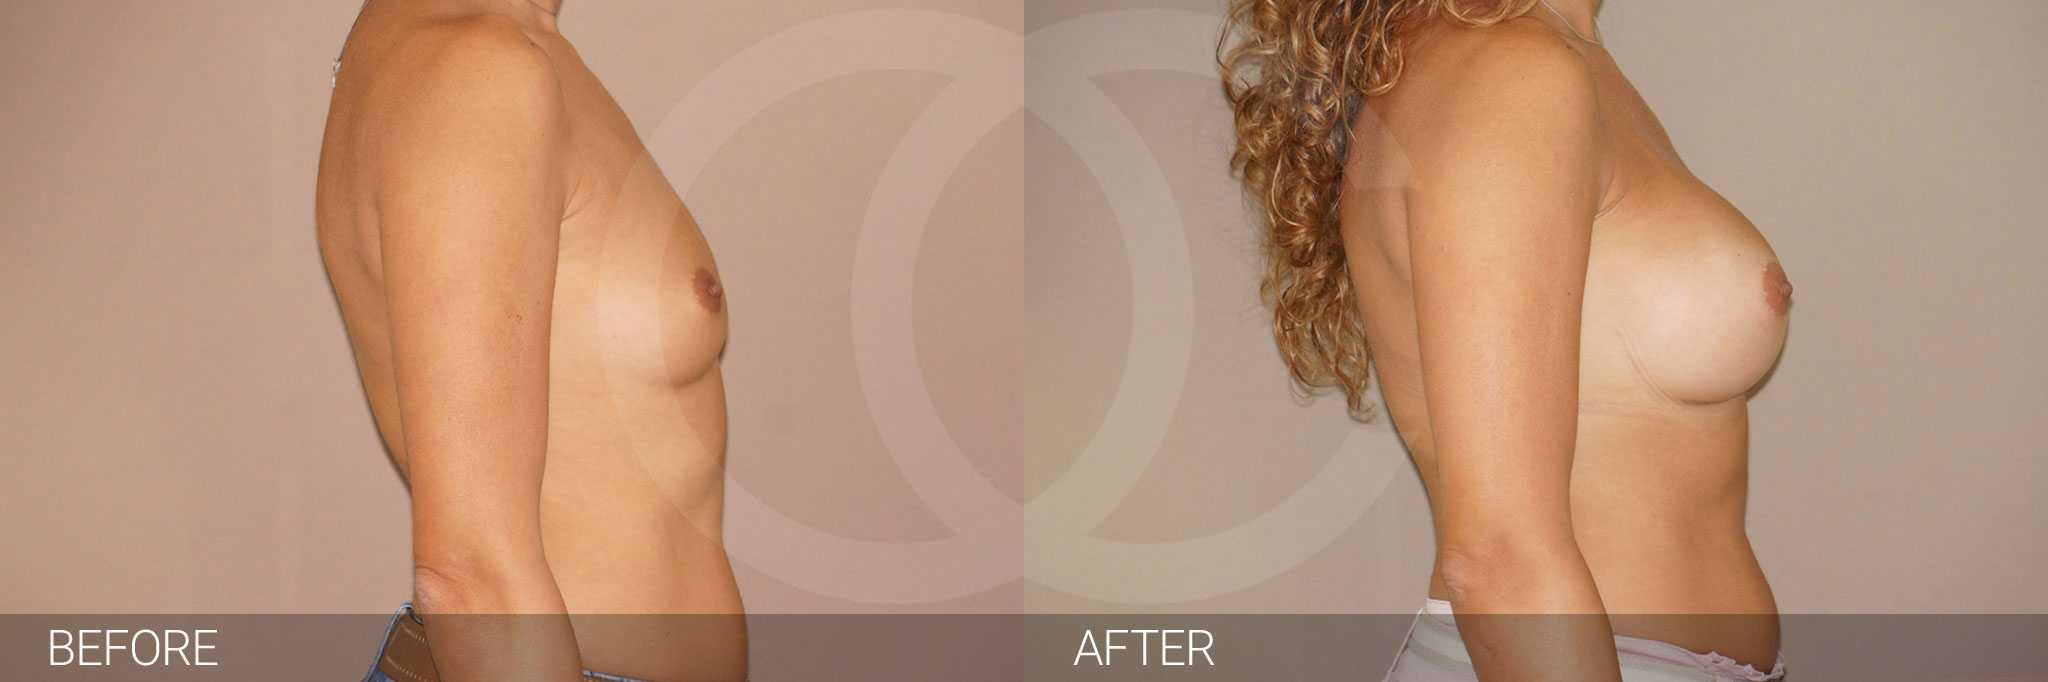 Augmentation mammaire Implants mammaires ante/post-op III